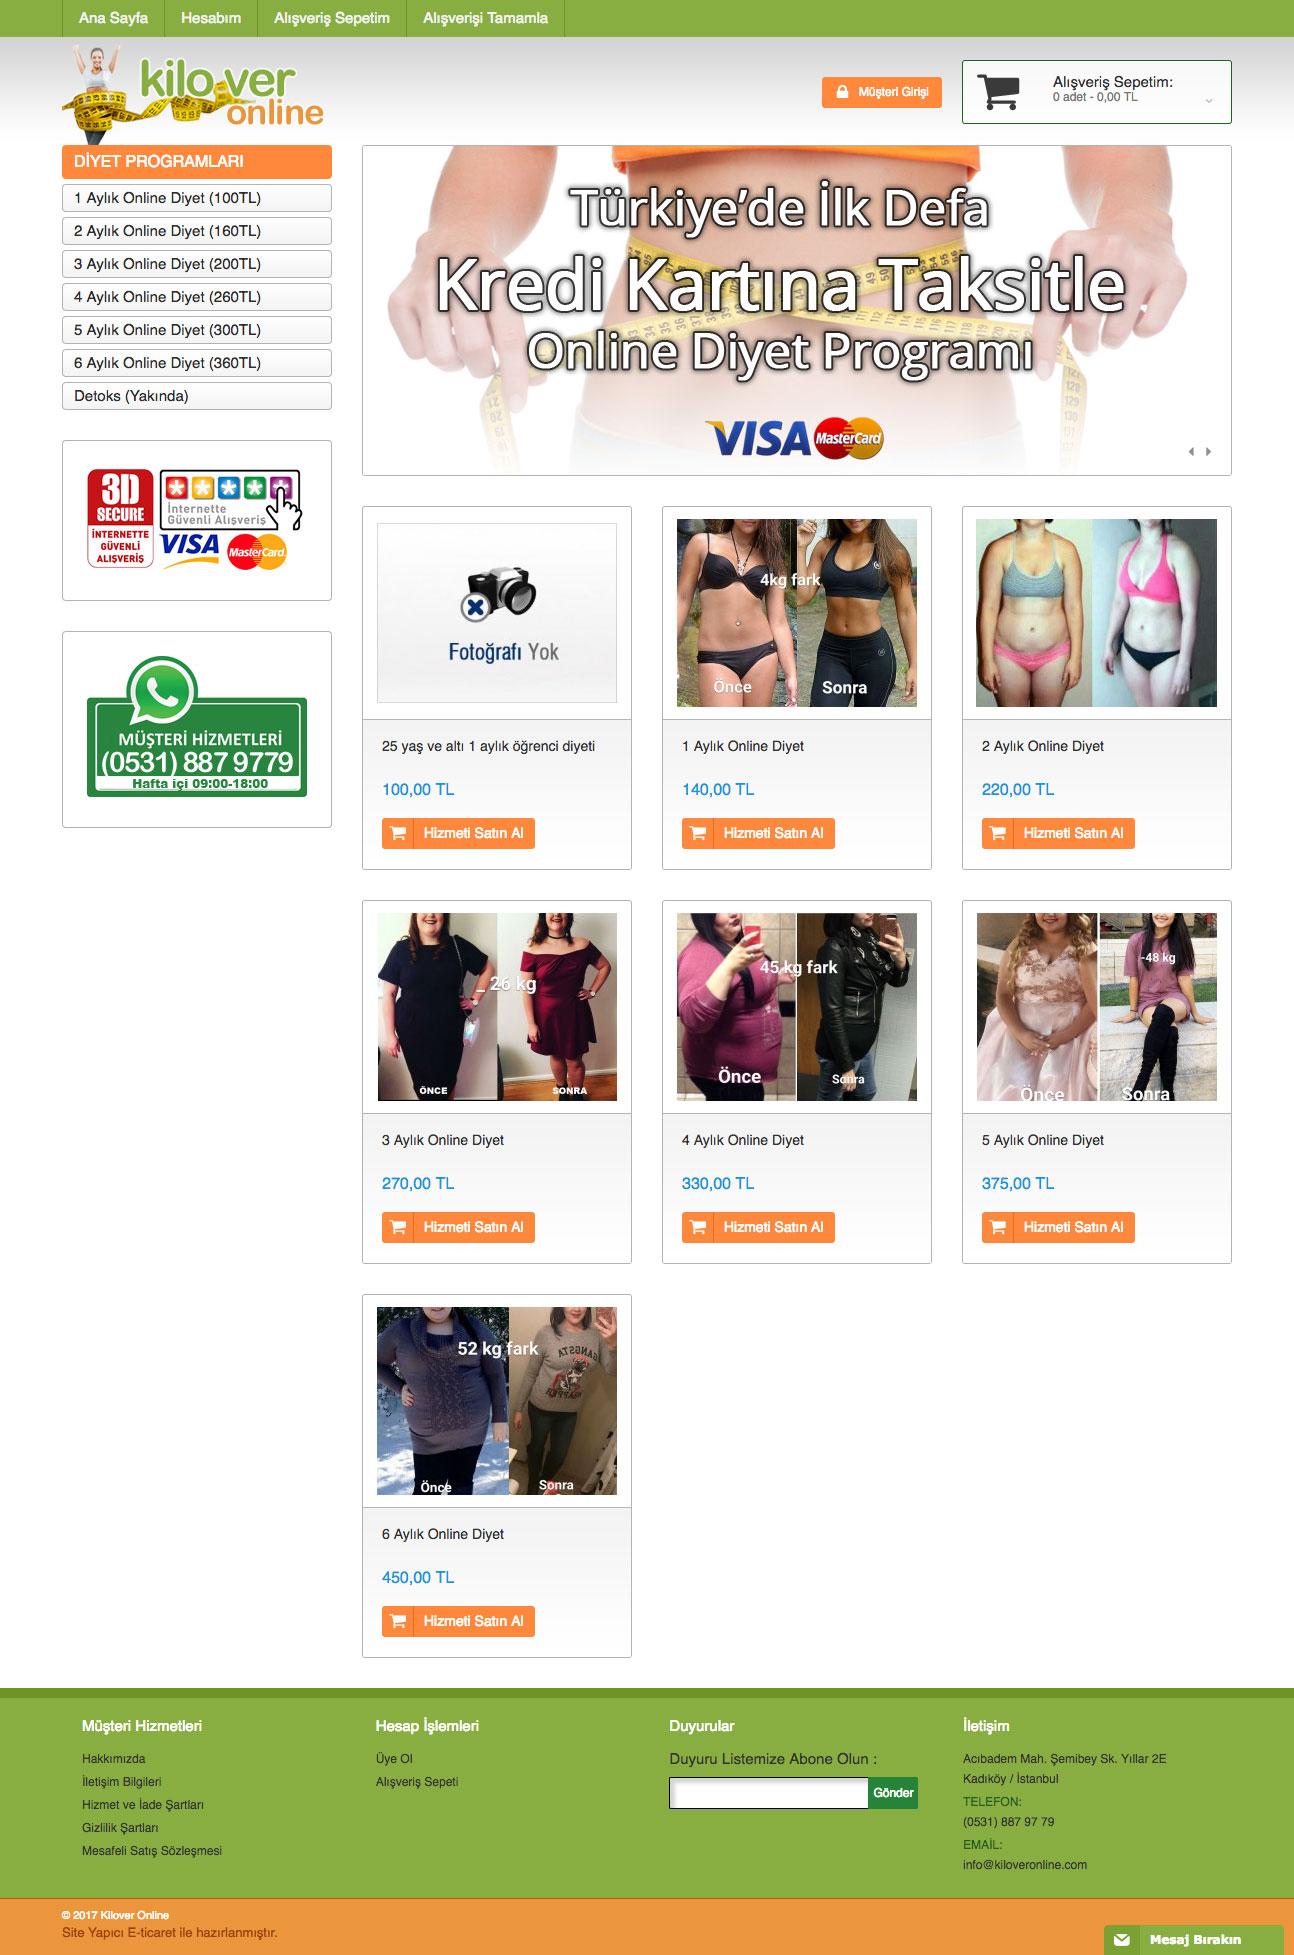 Kilover Online Web Sitesi